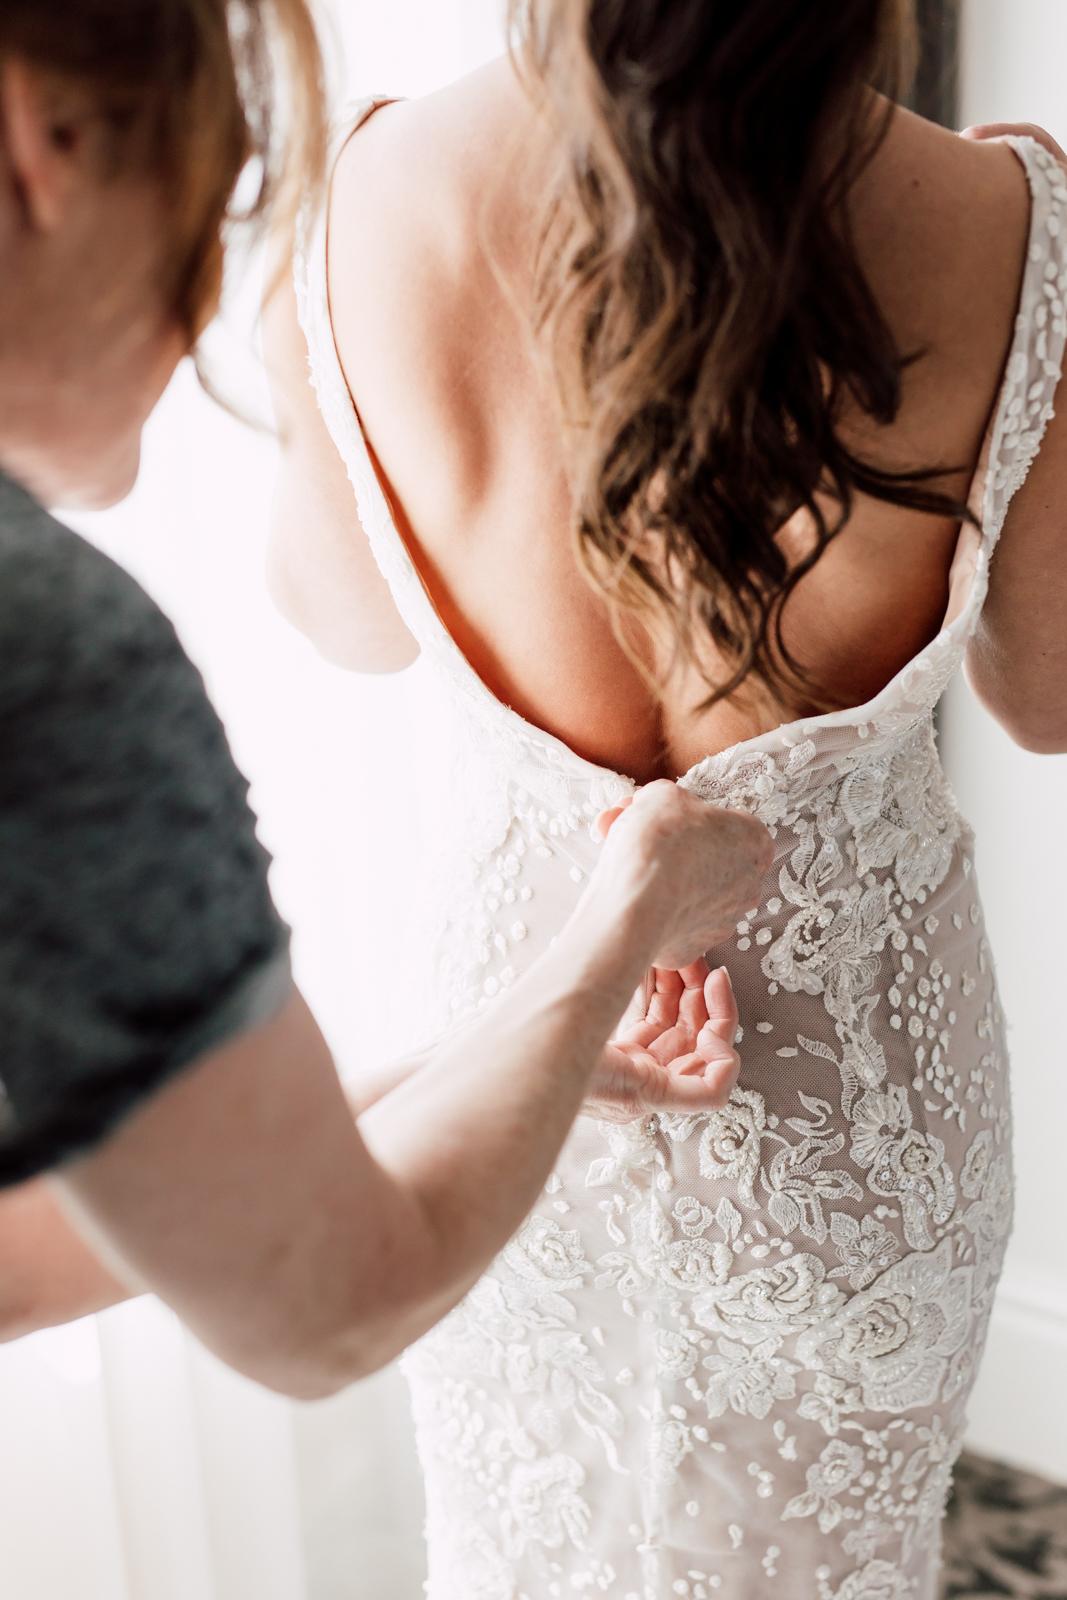 Leah de gloria bridal gown